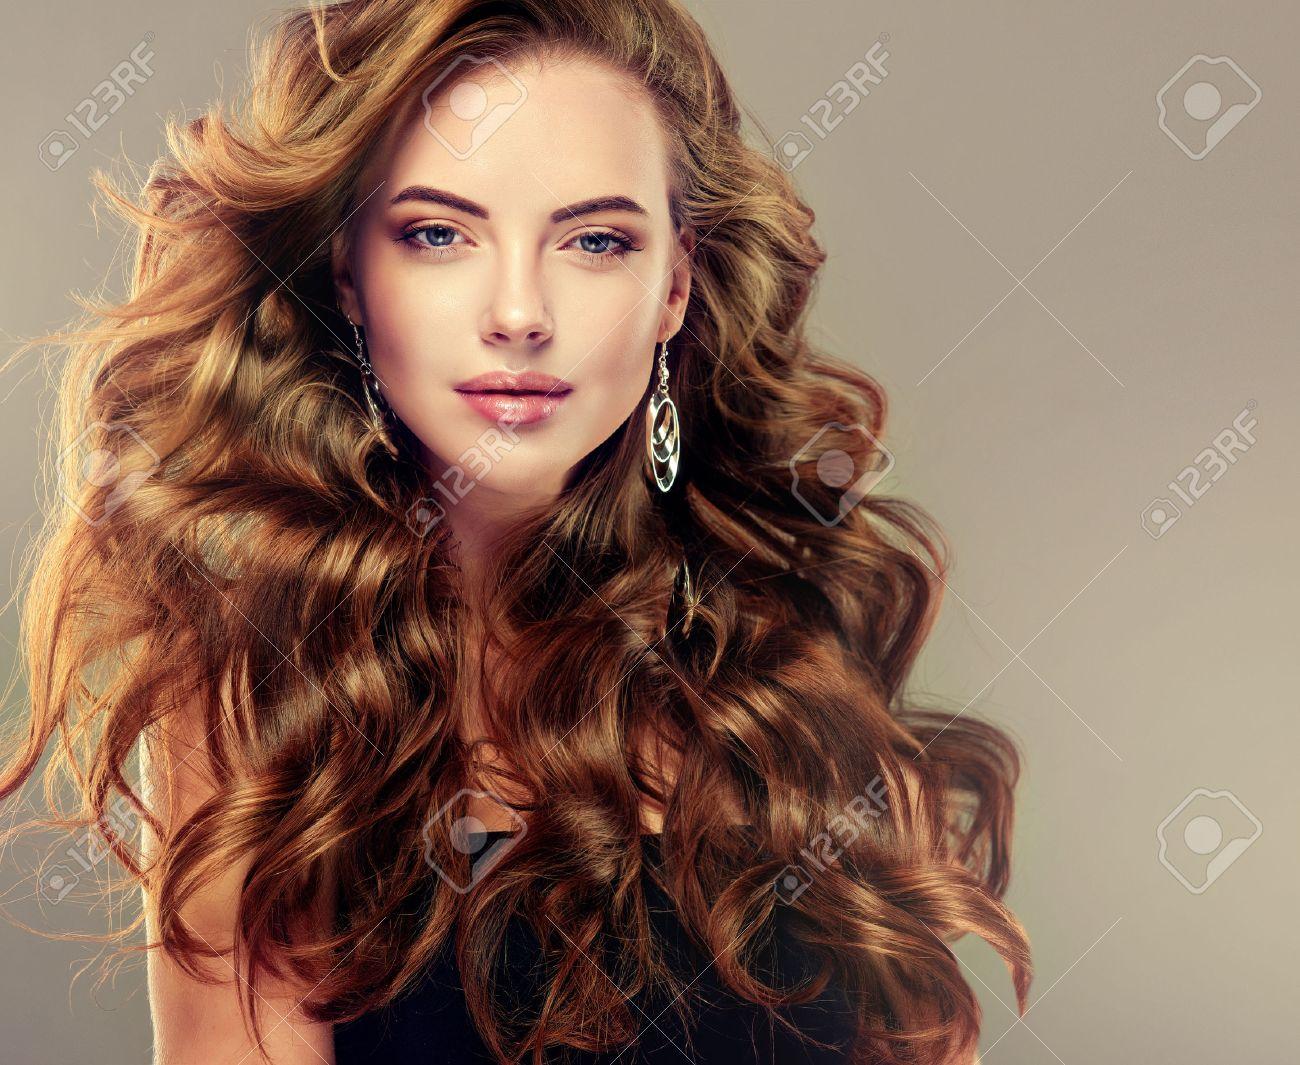 Belle Fille Avec De Longs Cheveux Ondules Modele Brune Avec